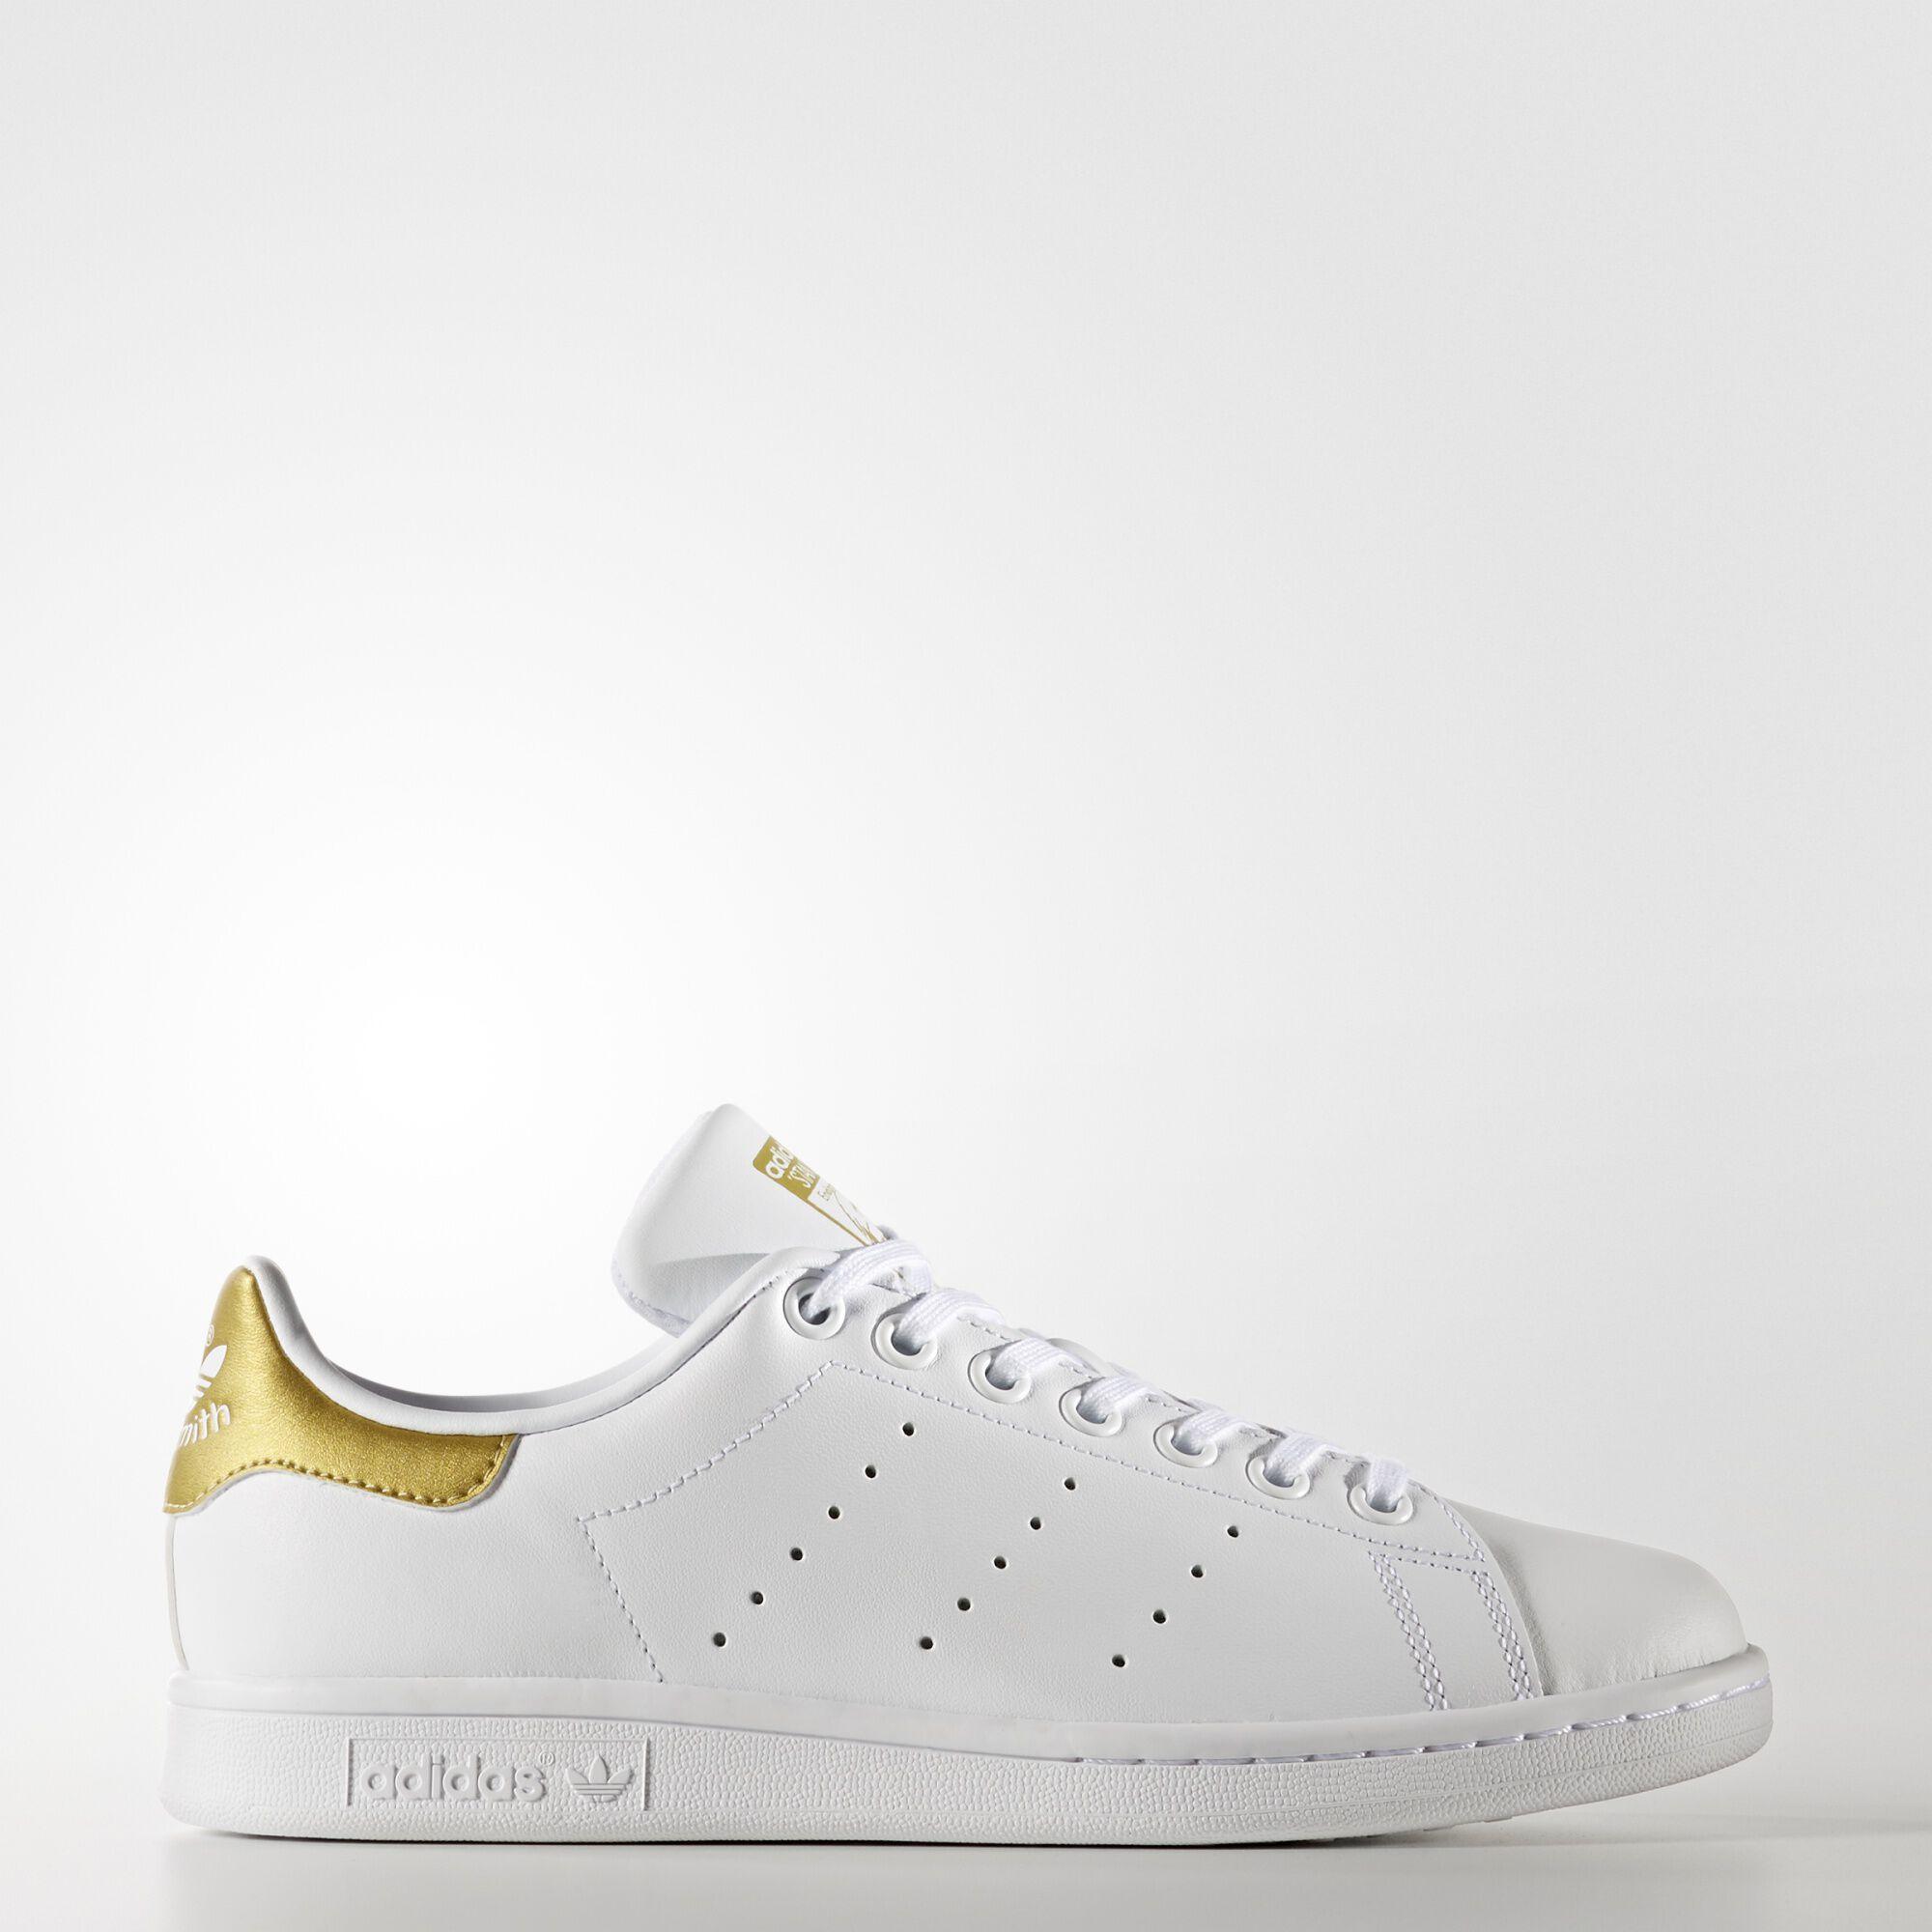 half off 6efd4 89005 adidas stan smith gold yellow